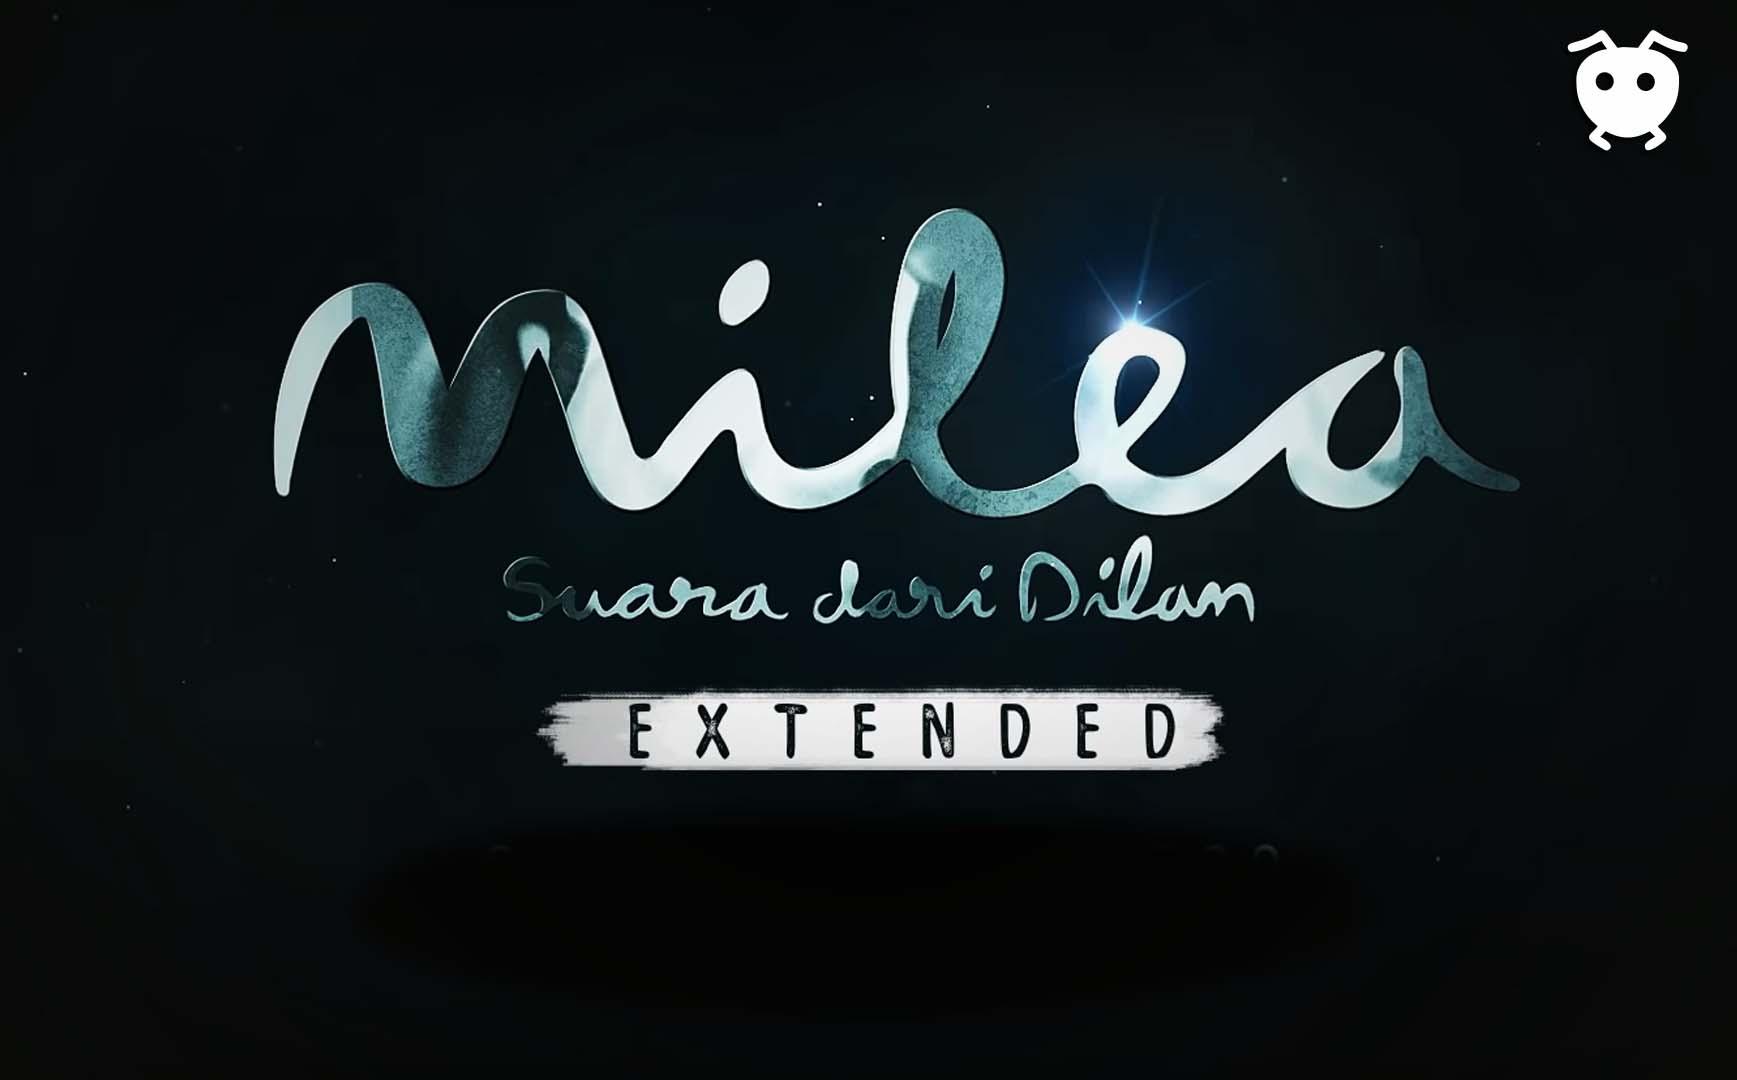 Nonton Milea Suara Dari Dilan Extended Full Movie Disini